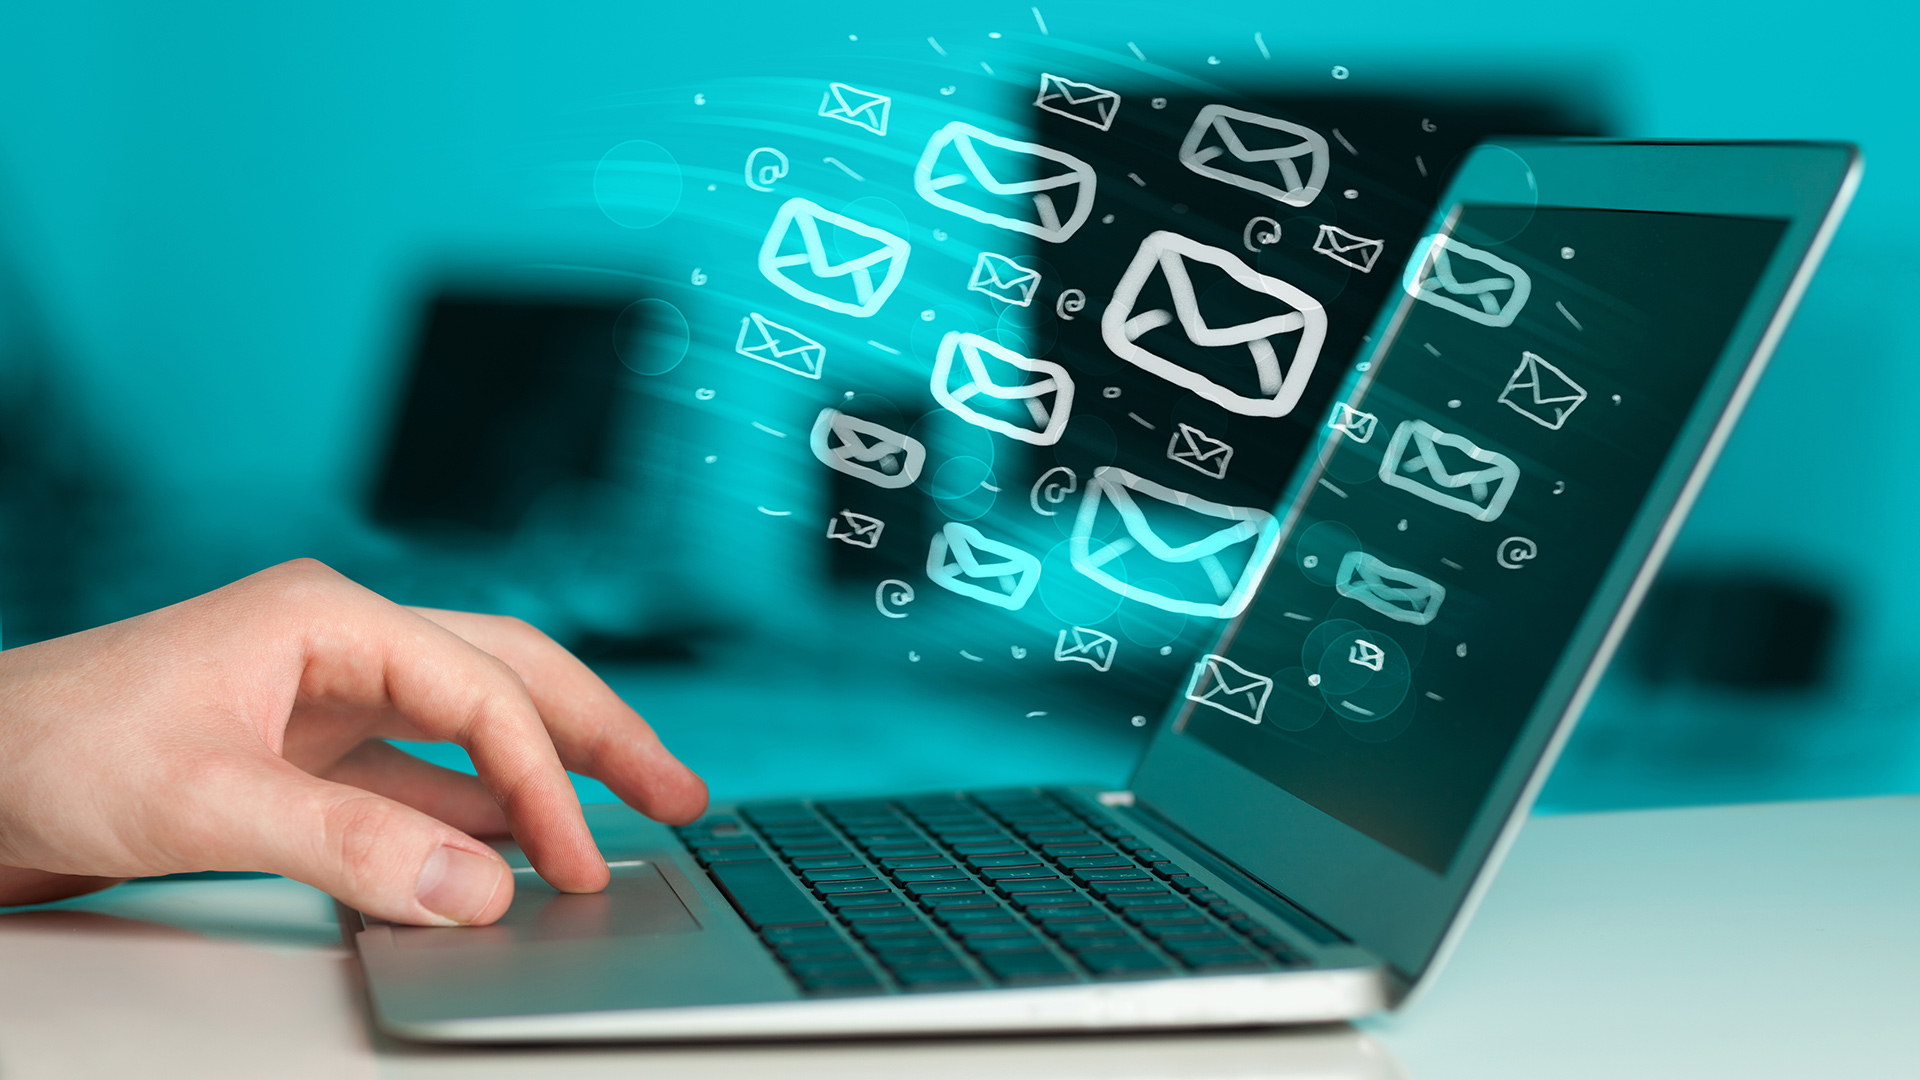 e-mail marketing insideout